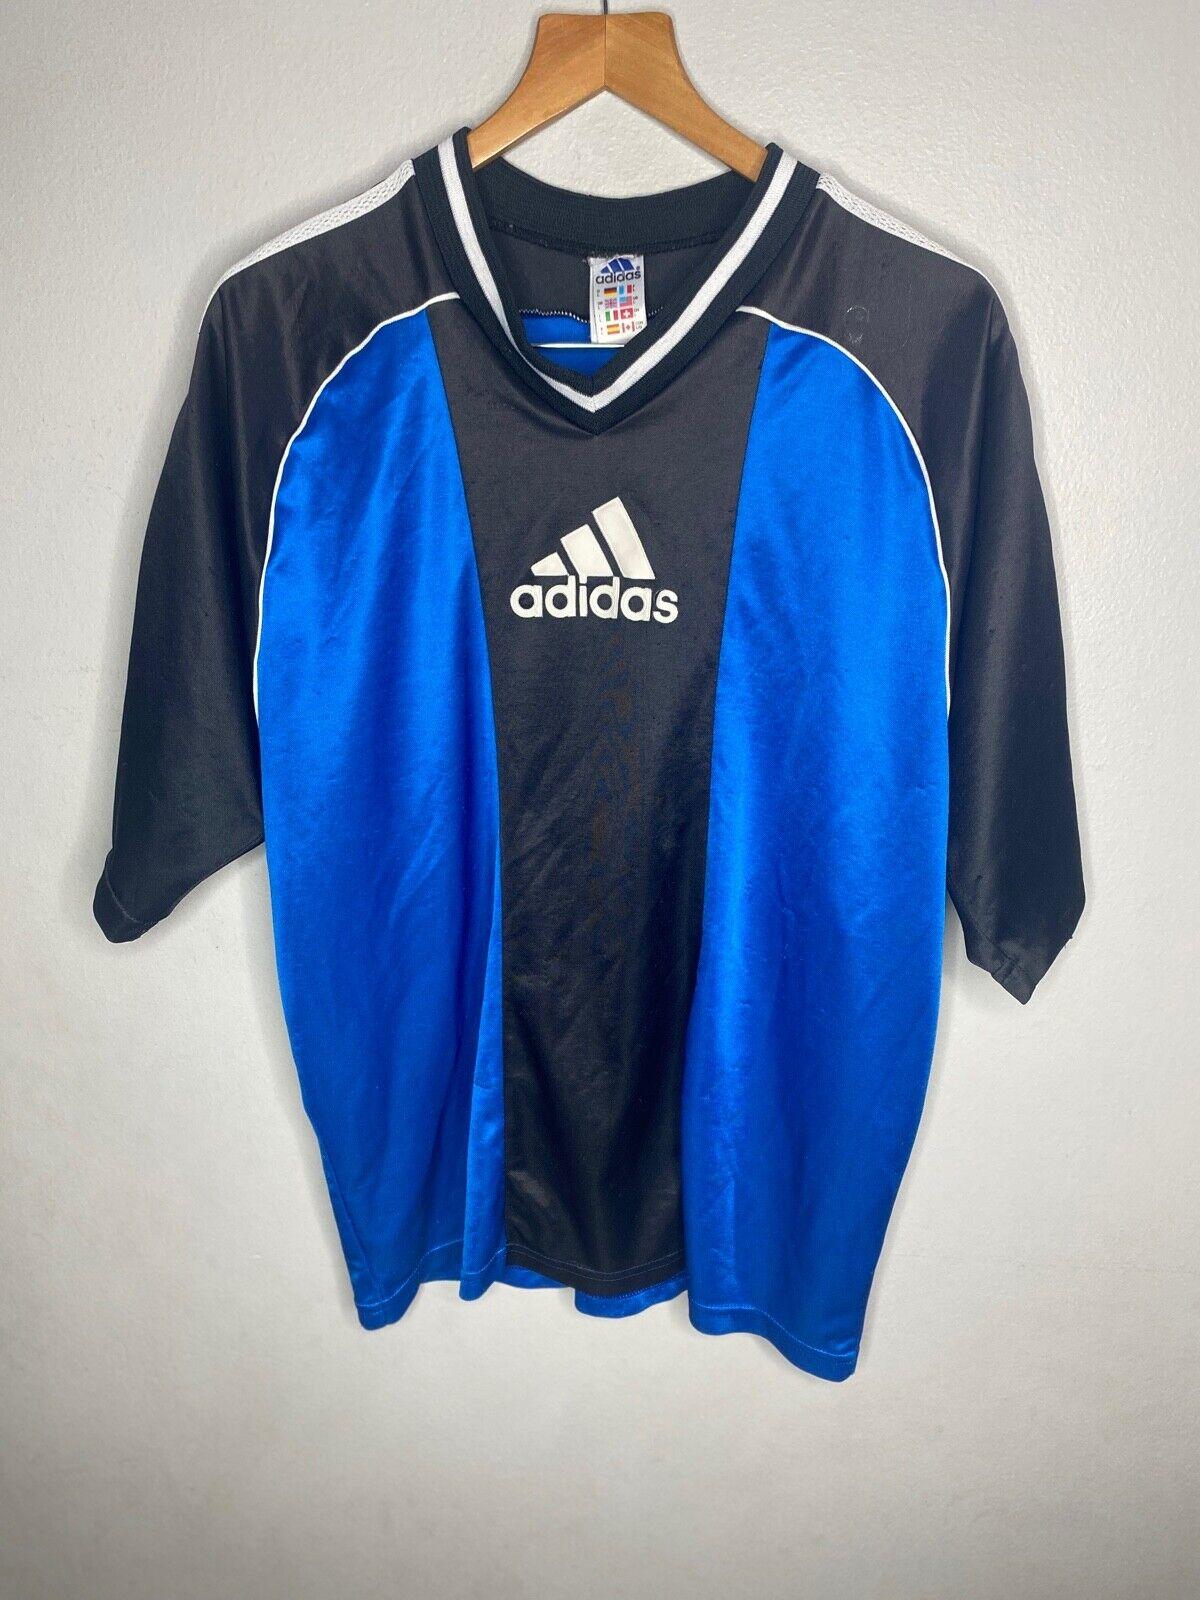 90s Vintage Superstar Adidas Soccer Jersey Size L Men's Short Sleeve (Flaw)